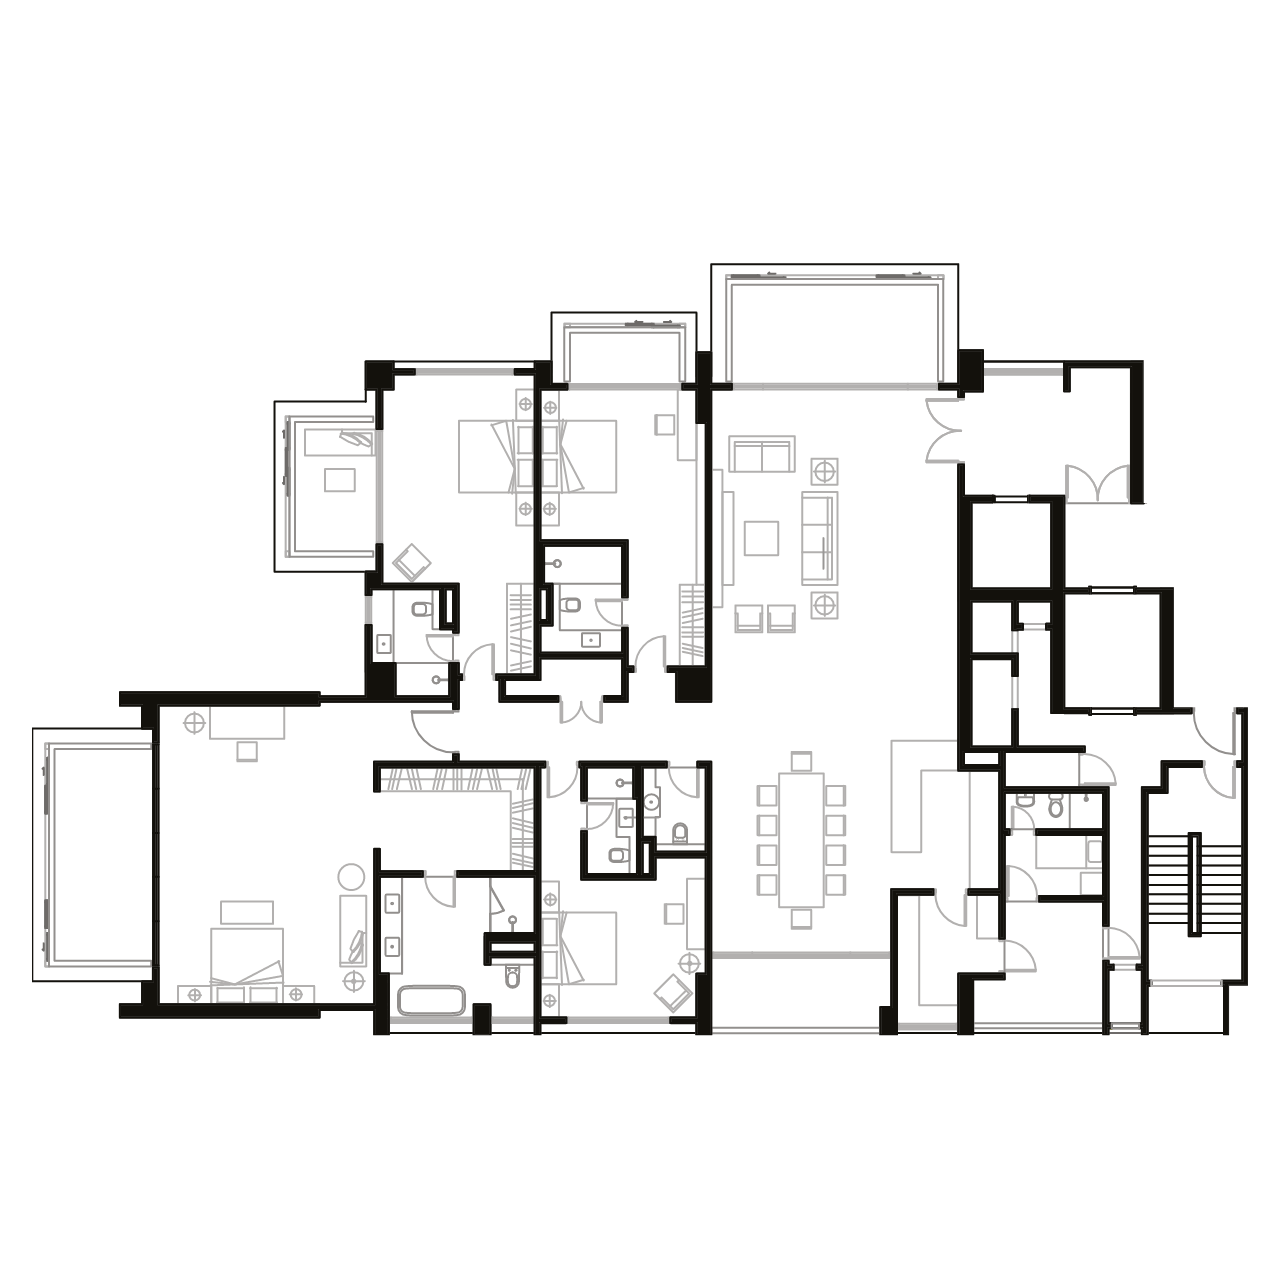 Ampang Condominium Floor Plan B1